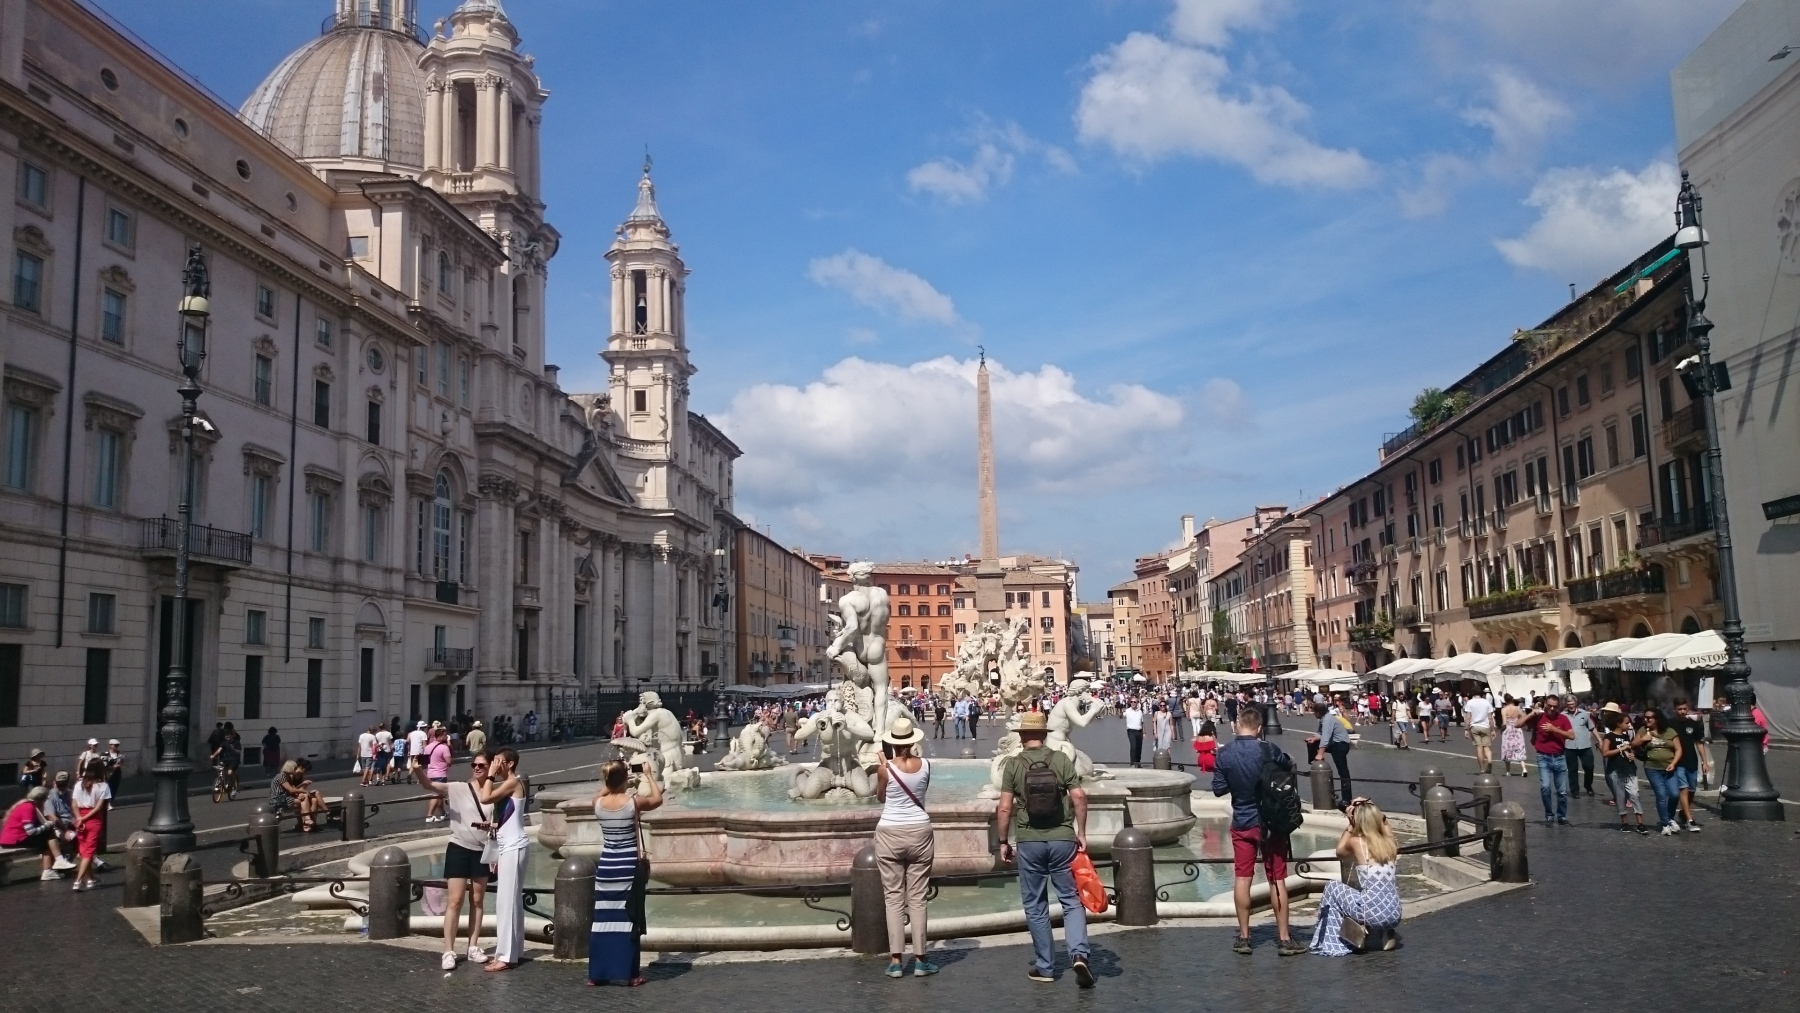 Piazza Navona 26